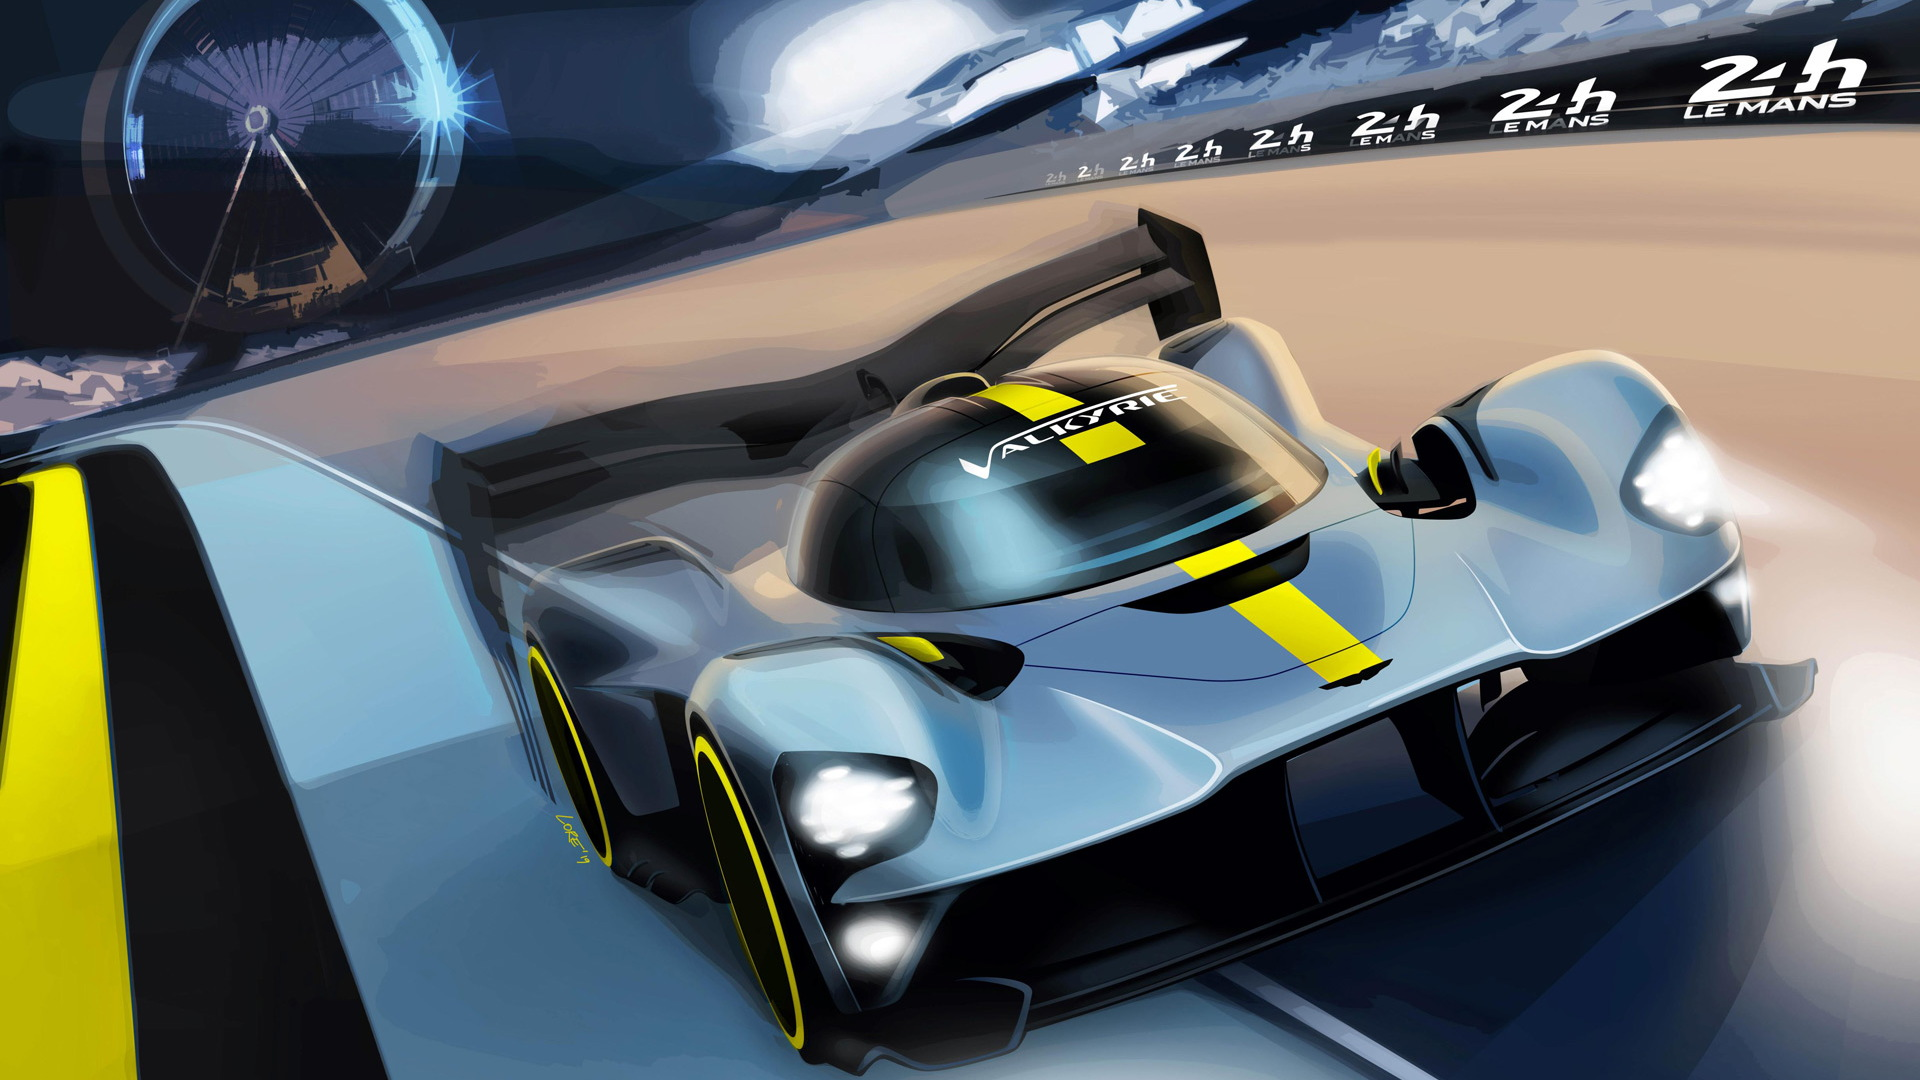 Teaser for 2020/2021 Aston Martin Valkyrie World Endurance Championship Hypercar class race car